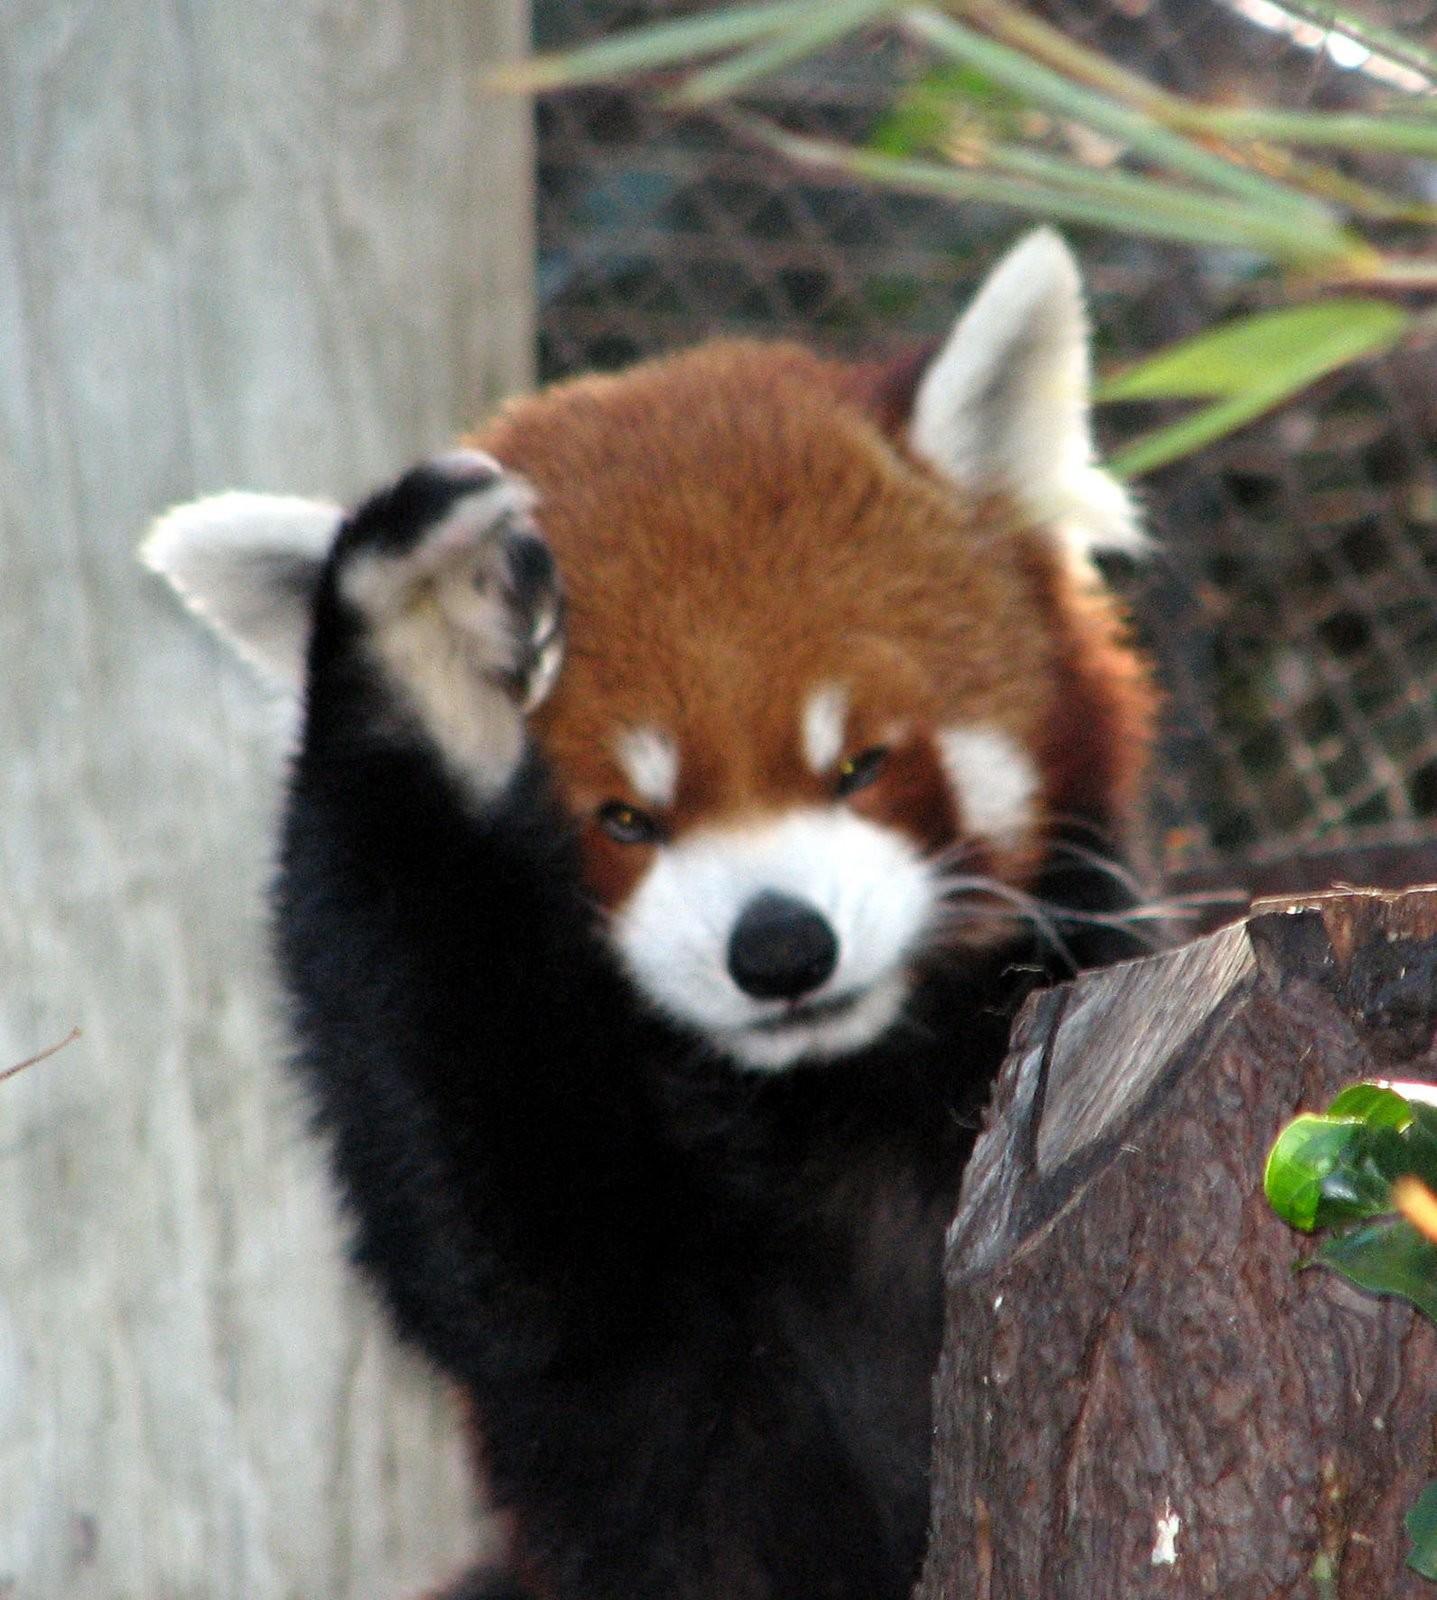 Fondos De Pantalla : Animales, Fauna Silvestre, Panda